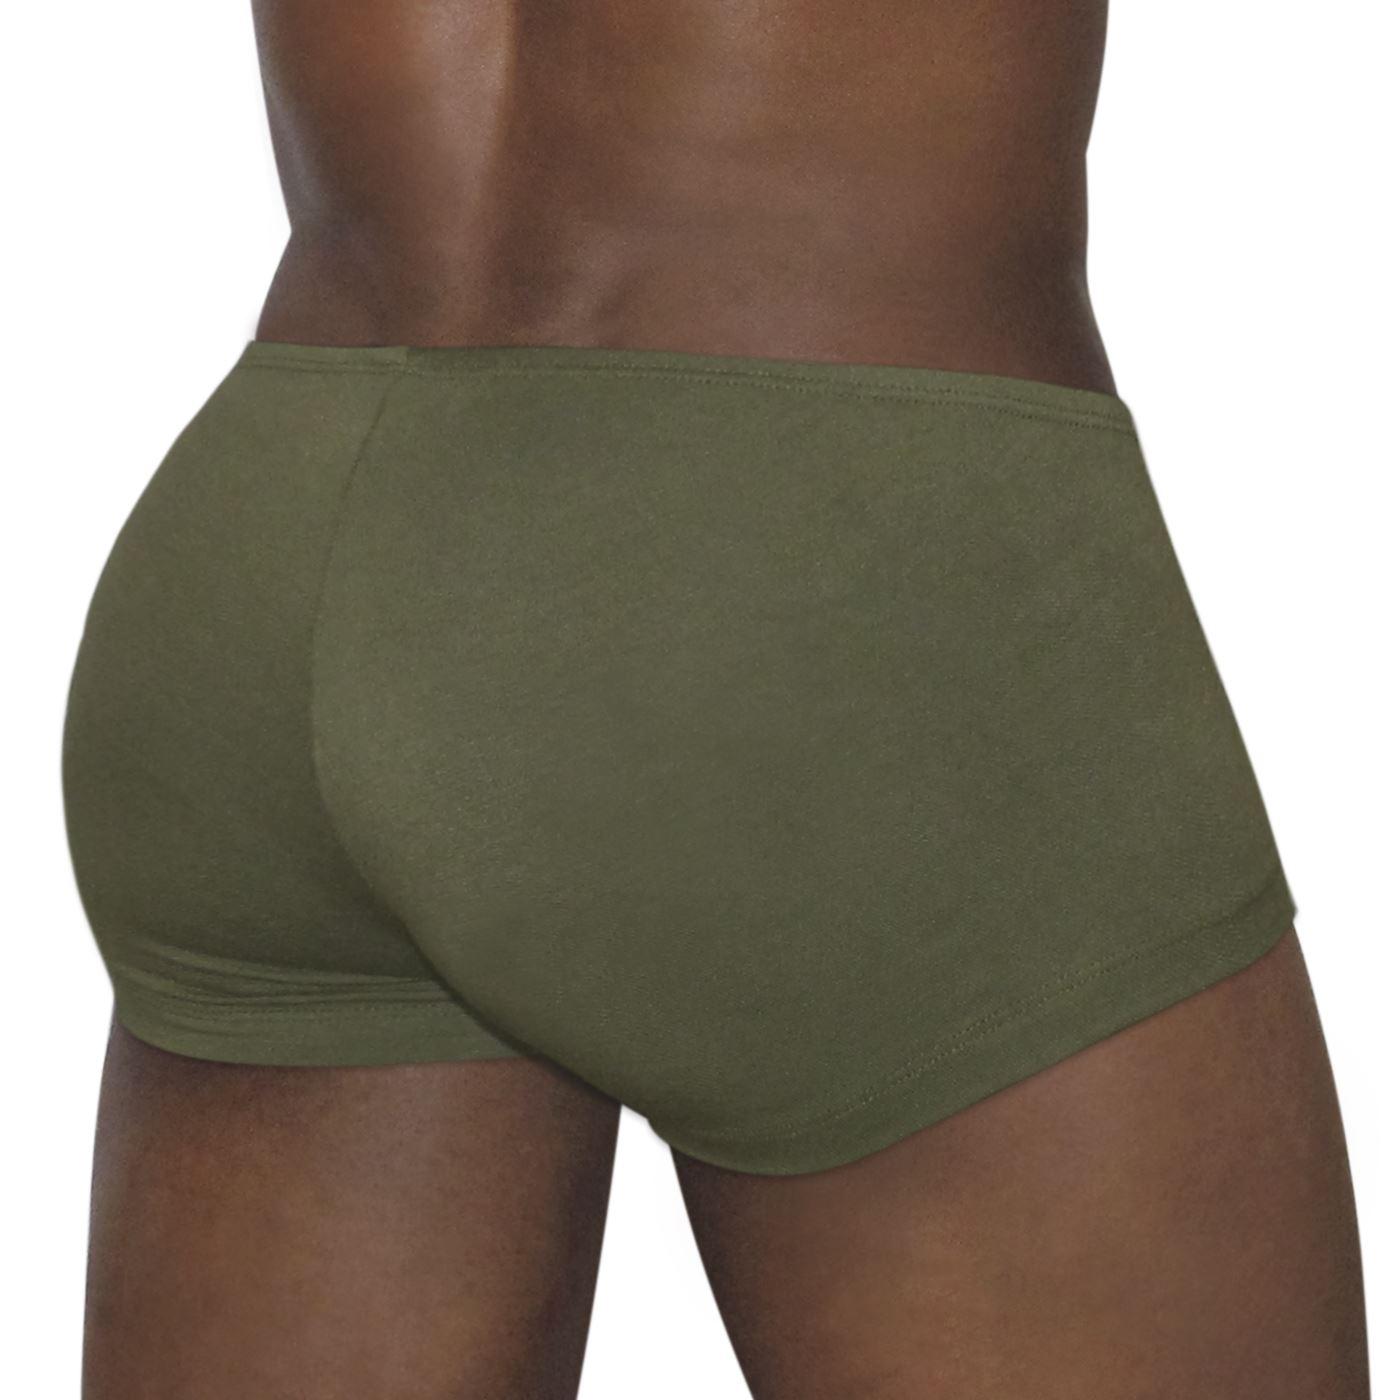 Ergowear-X3D-Modal-Mini-Boxer-men-039-s-underwear-enhance-short-low-rise-trunk-brief miniatuur 7